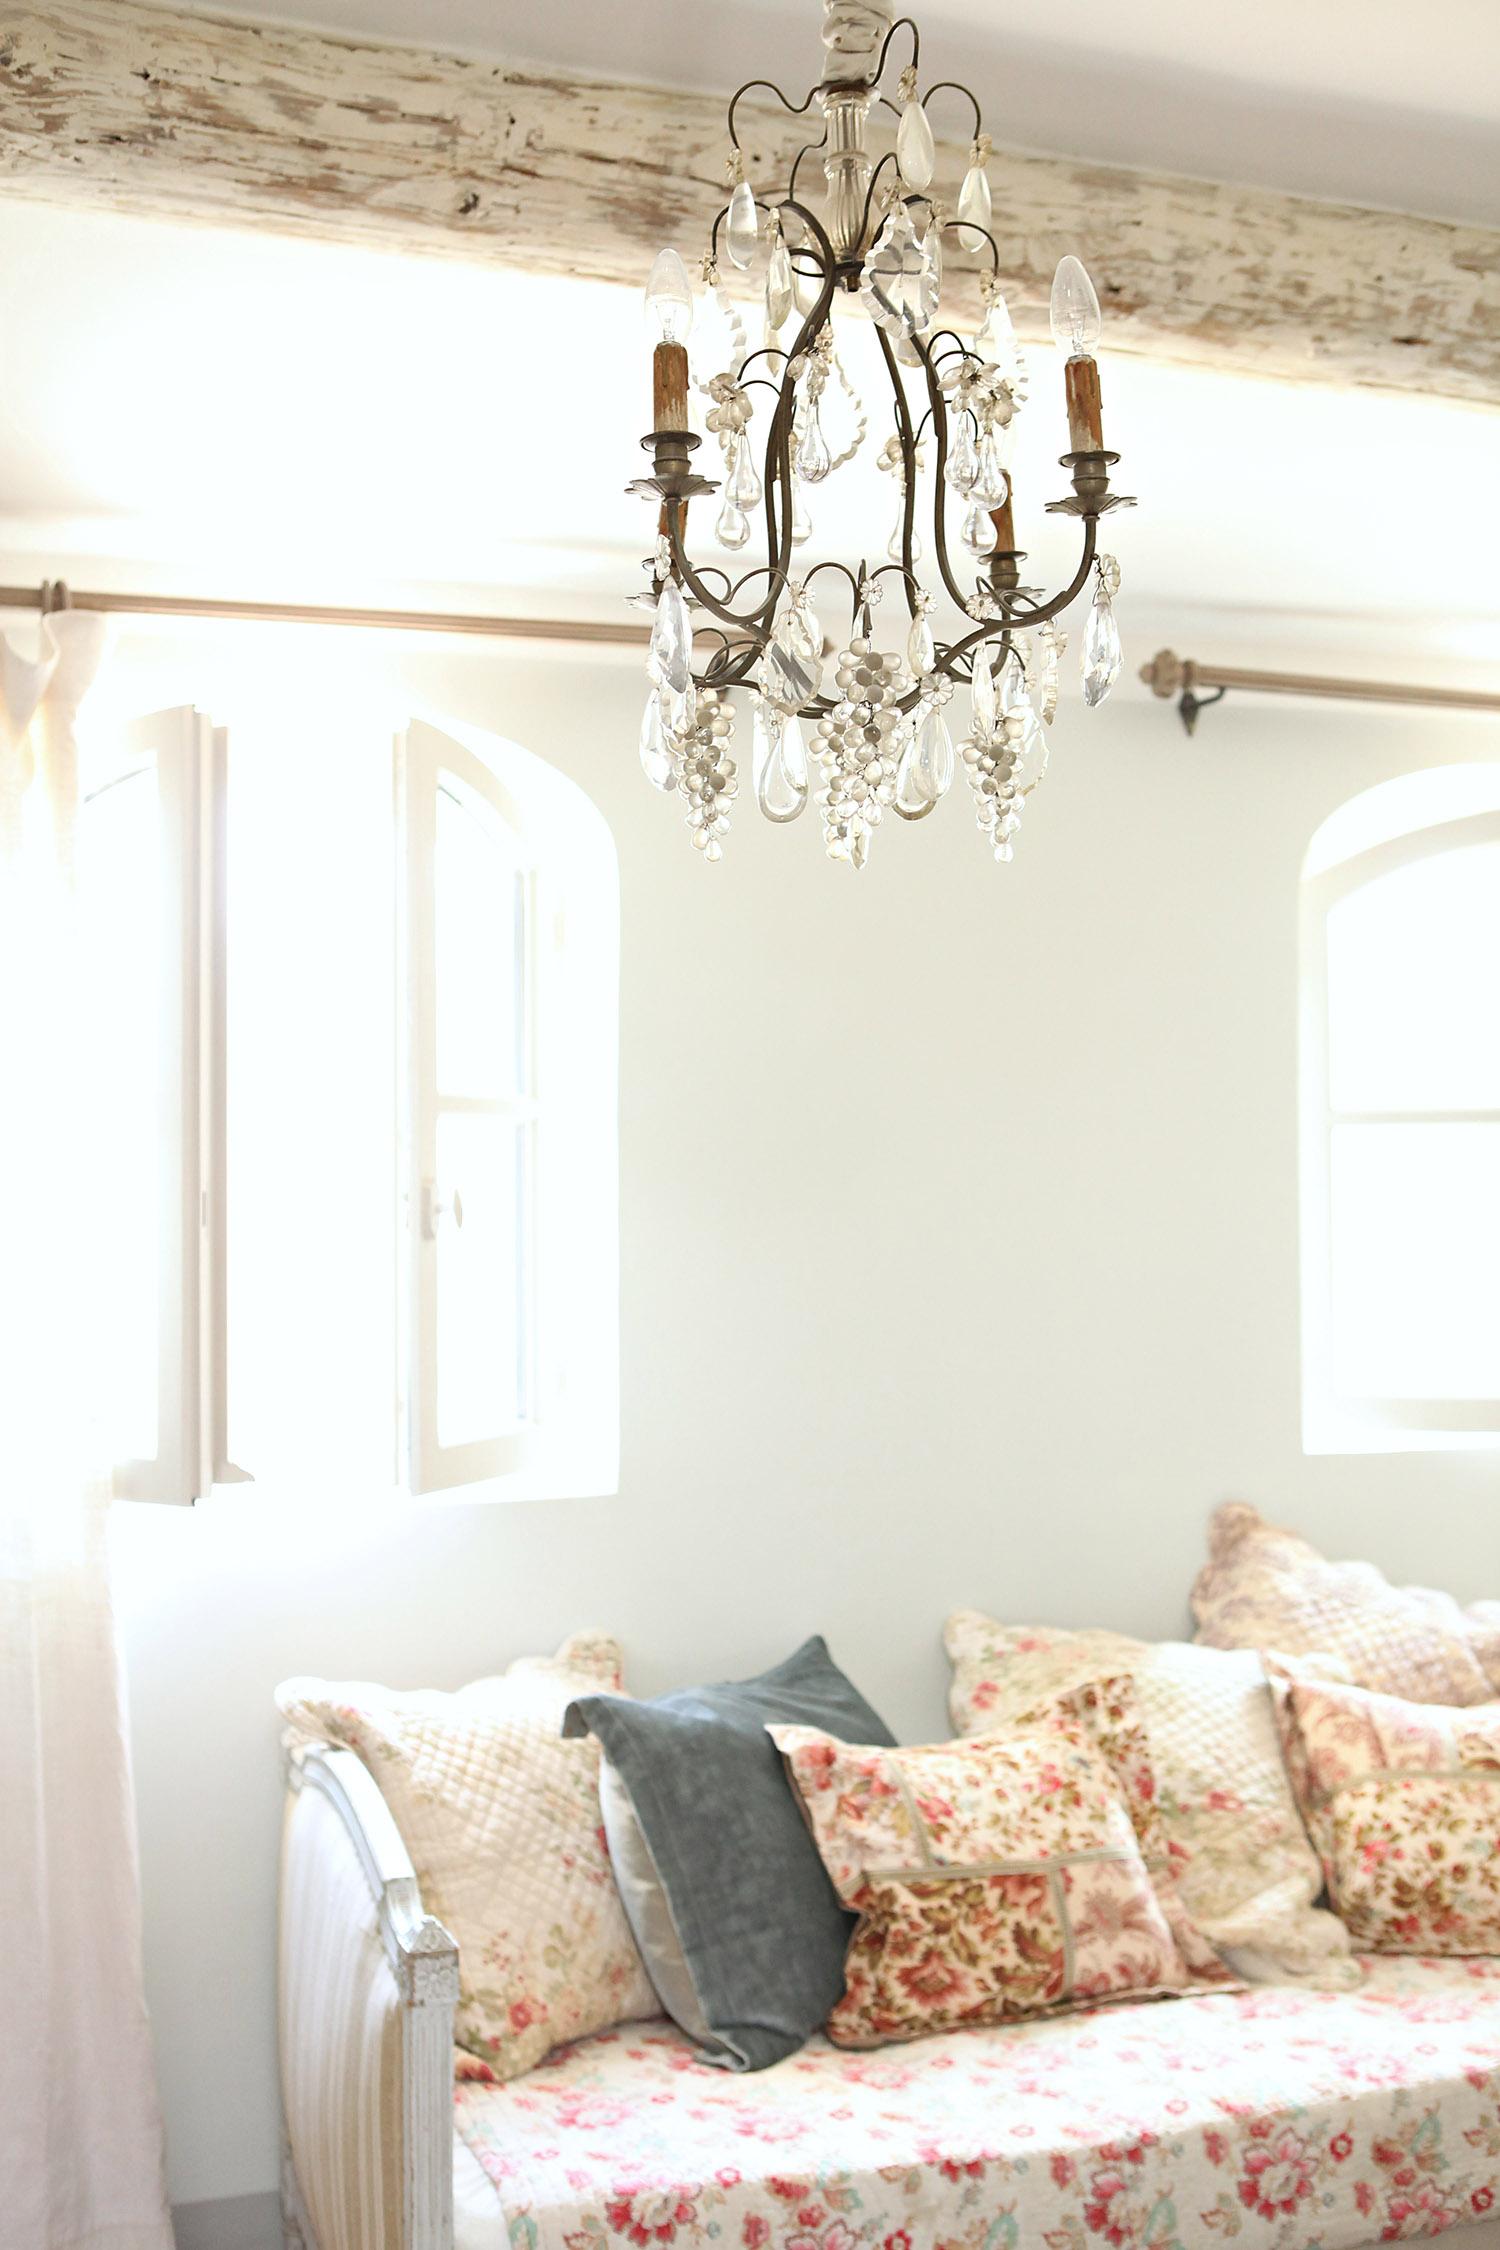 provence-chandelier.jpg